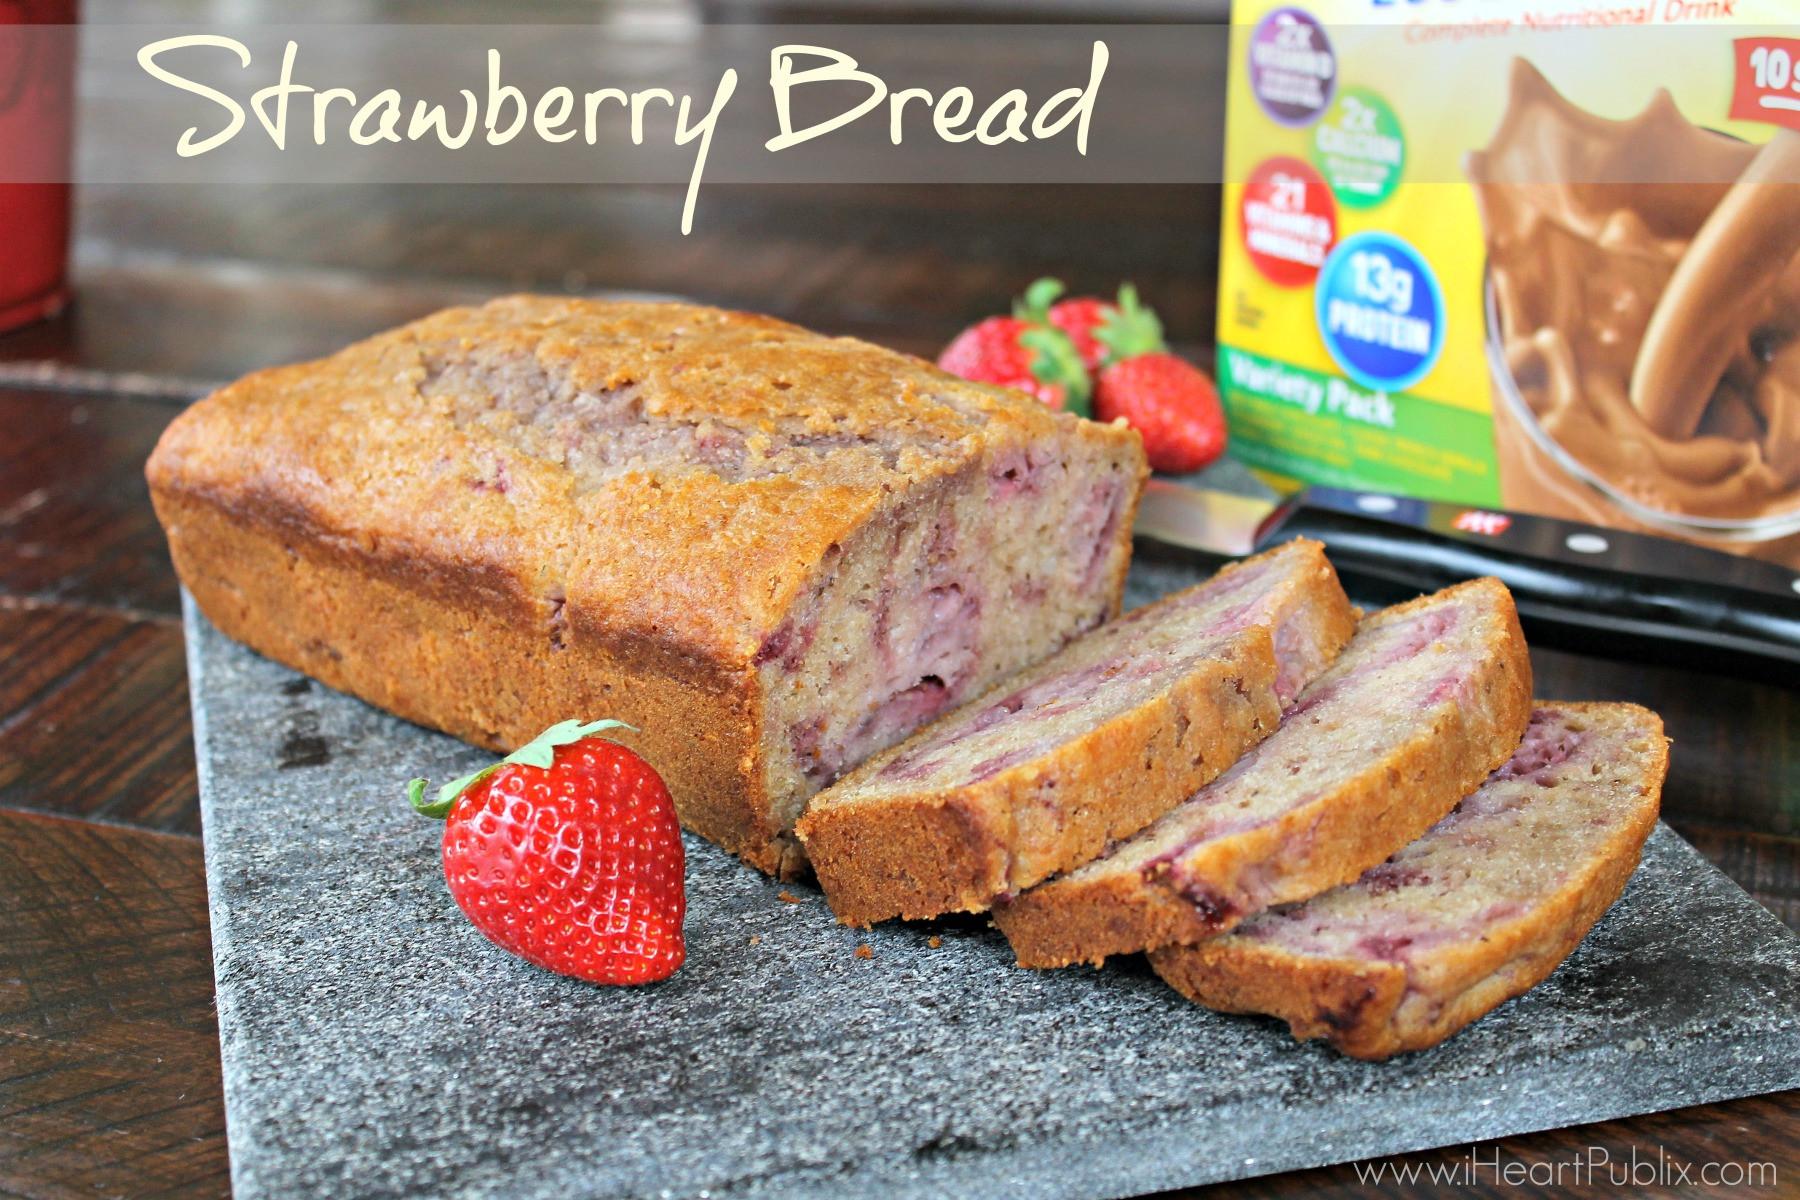 Bread And Breakfast  Strawberry Breakfast Bread Delicious Recipe Made With